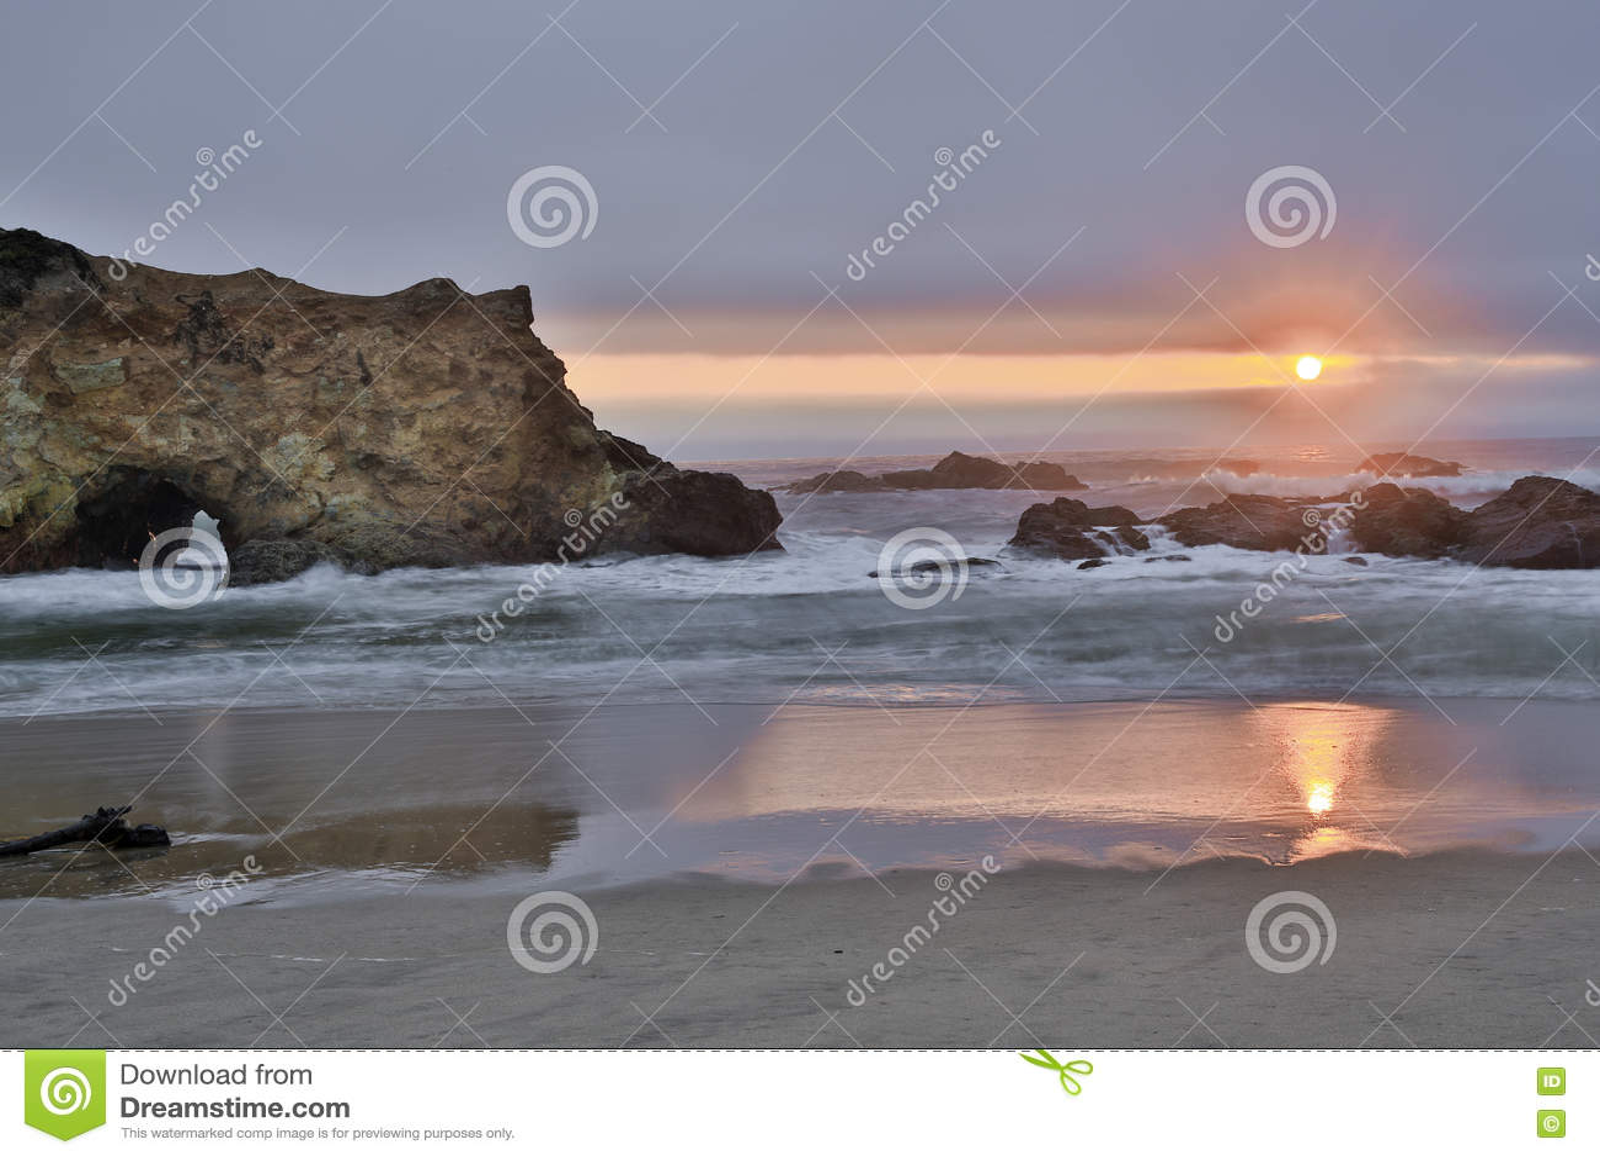 California san mateo county pescadero - Sunset Over Pescadero State Beach In San Mateo County California